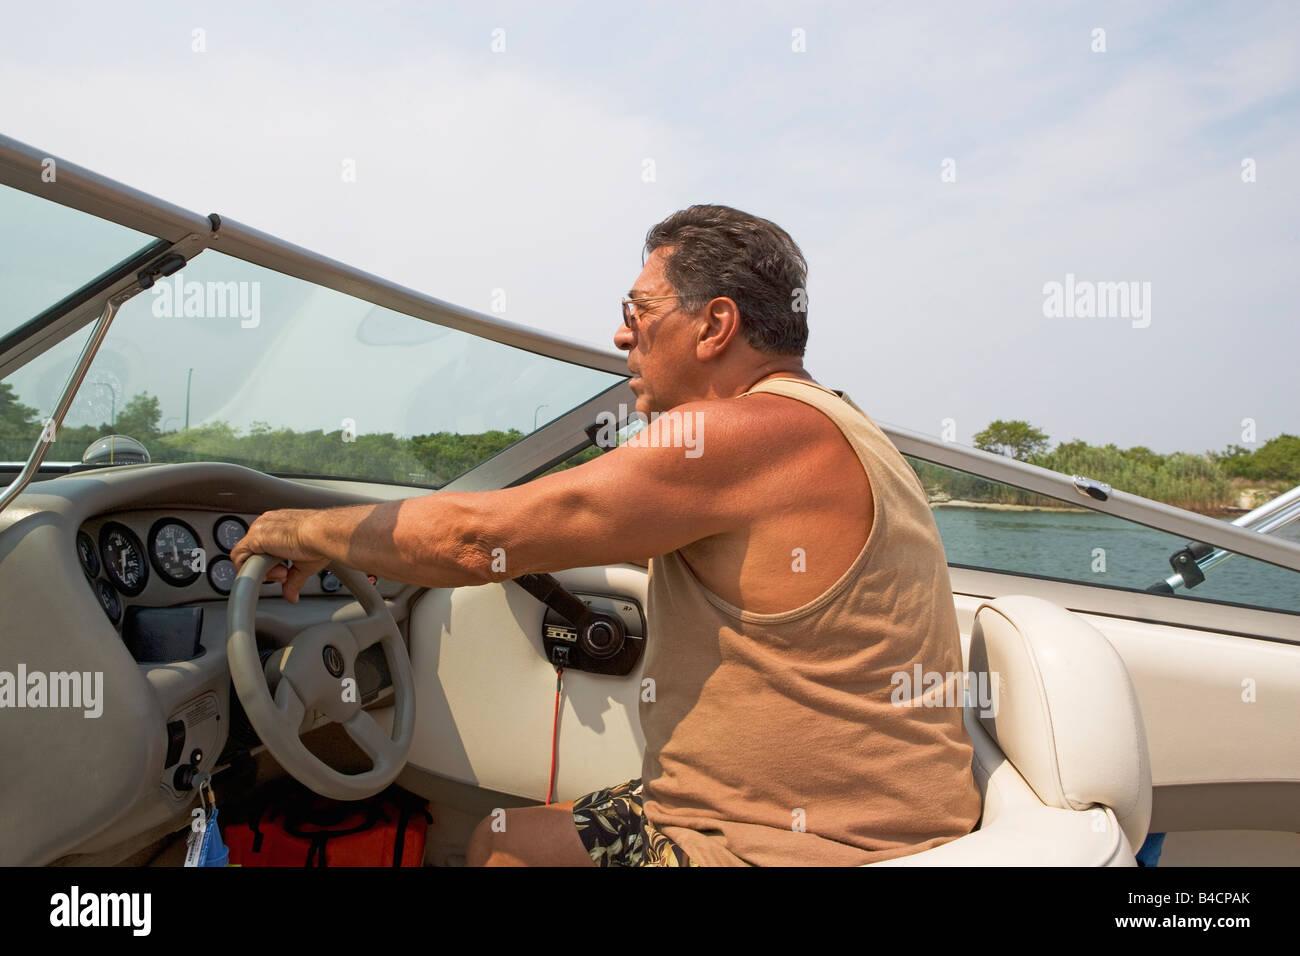 power, boat, motor, water, sport, cruising, recreation, fast Stock on